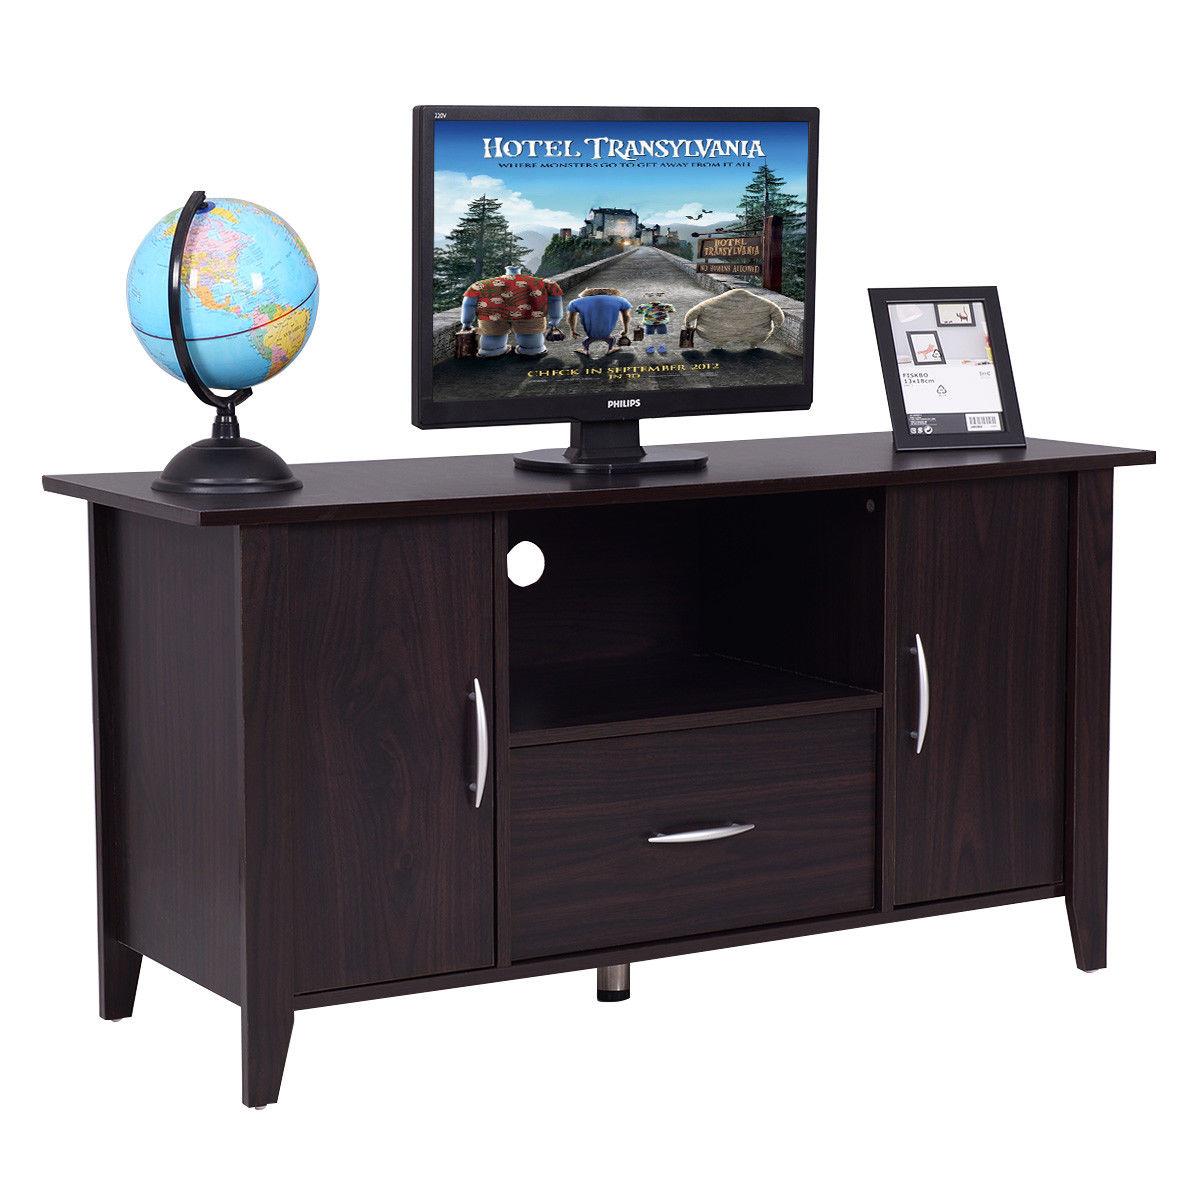 Giantex Modern Living Room TV Cabinet Media Unit Storage Shelf TV Stand Media Console Furniture Home HW54821NA